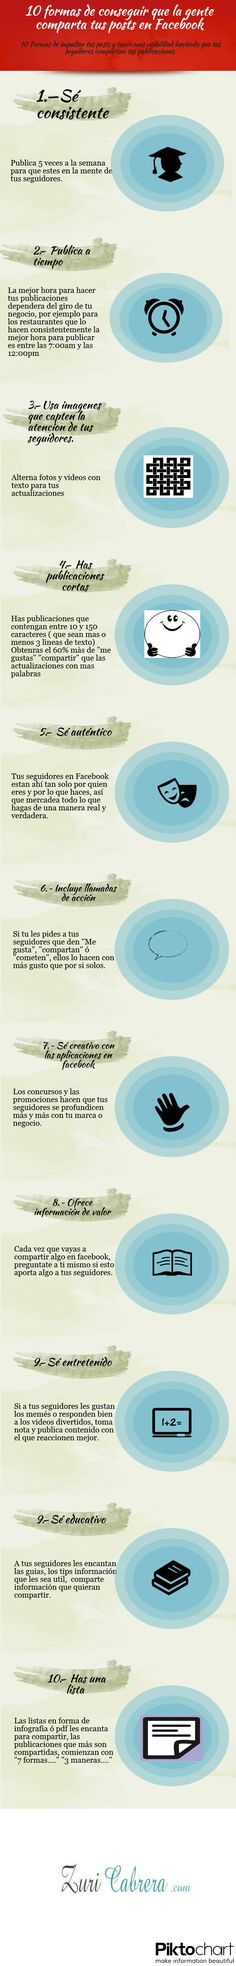 10 formas de que compartan tus posts de FaceBook #infografia #infographic #socialmedia